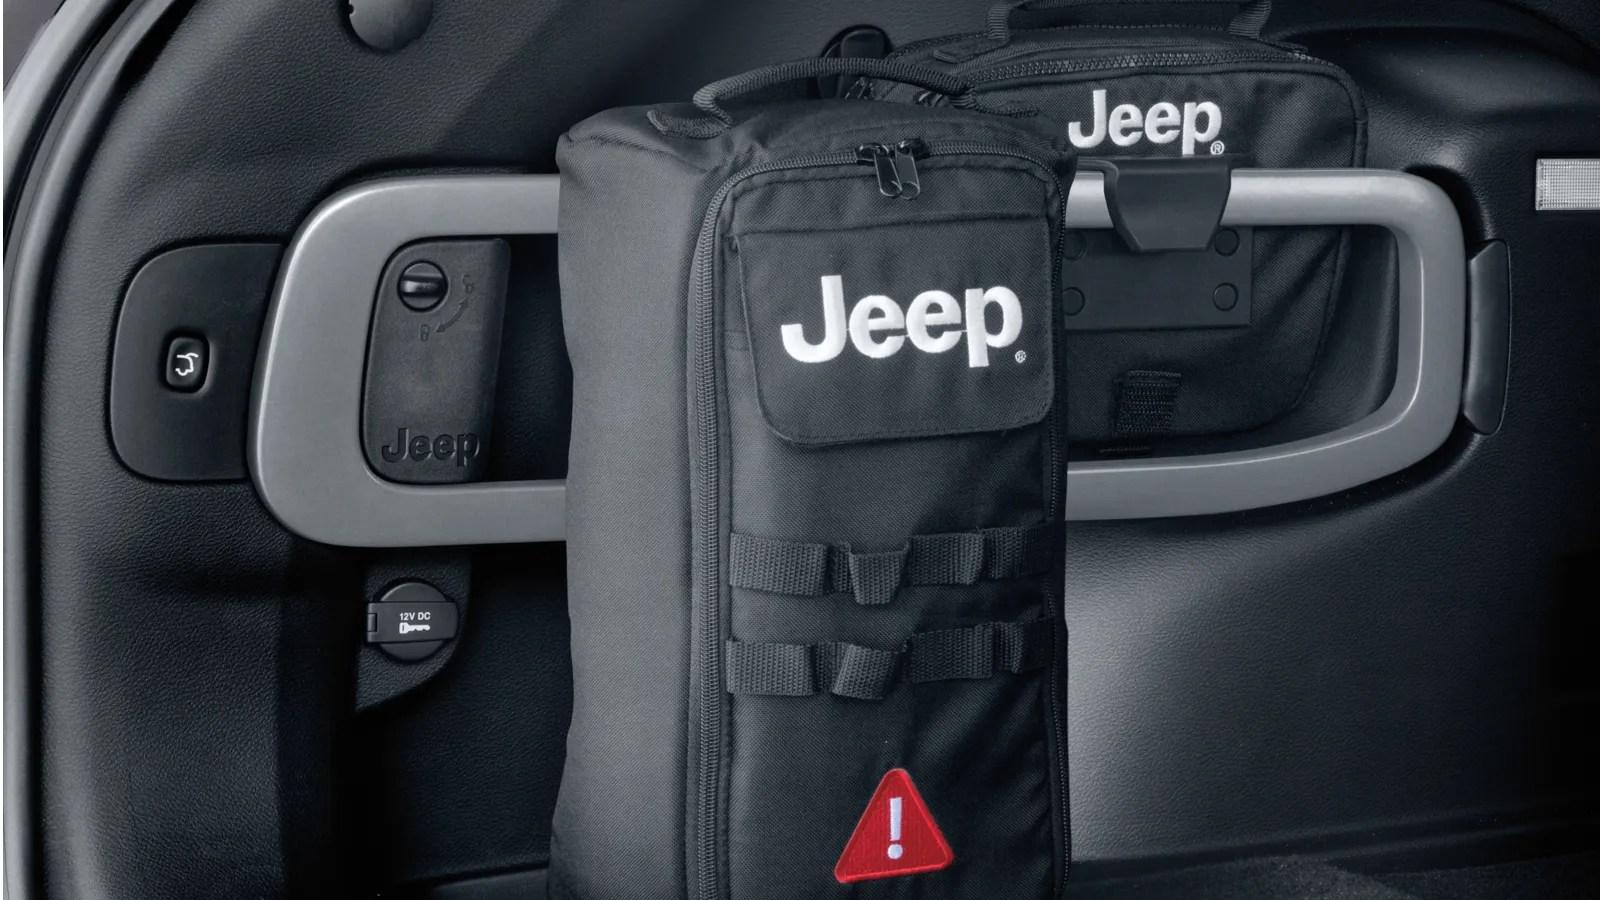 Jeep Renegade Interior Accessories